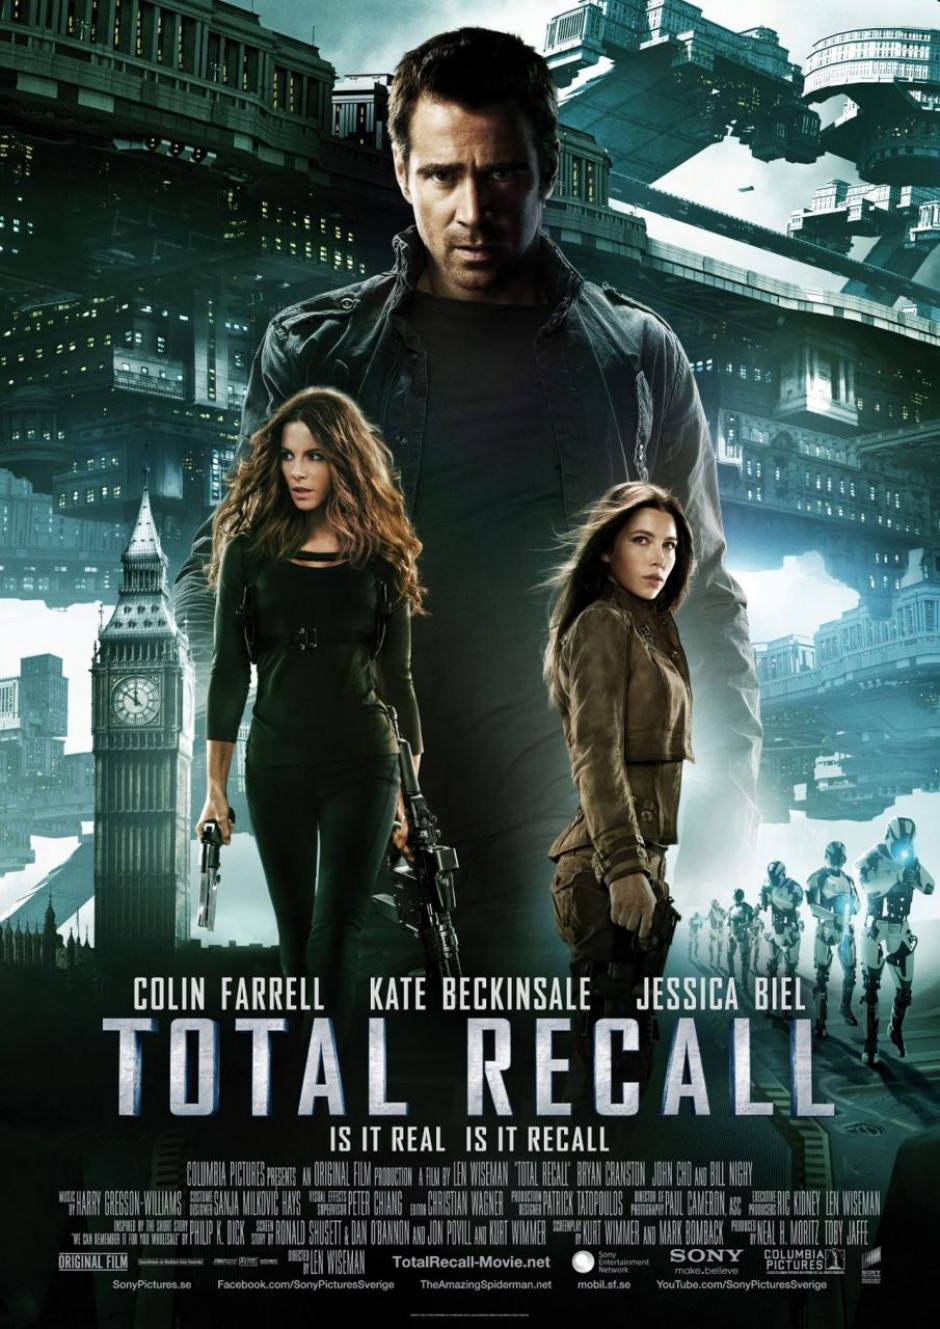 http://2.bp.blogspot.com/-L-5uVHN4xrw/UA67CuFXRcI/AAAAAAAAEs8/2Ep06kHVL1o/s1600/Total-Recall-2012-Movie-Poster1-e1342103315897.jpg